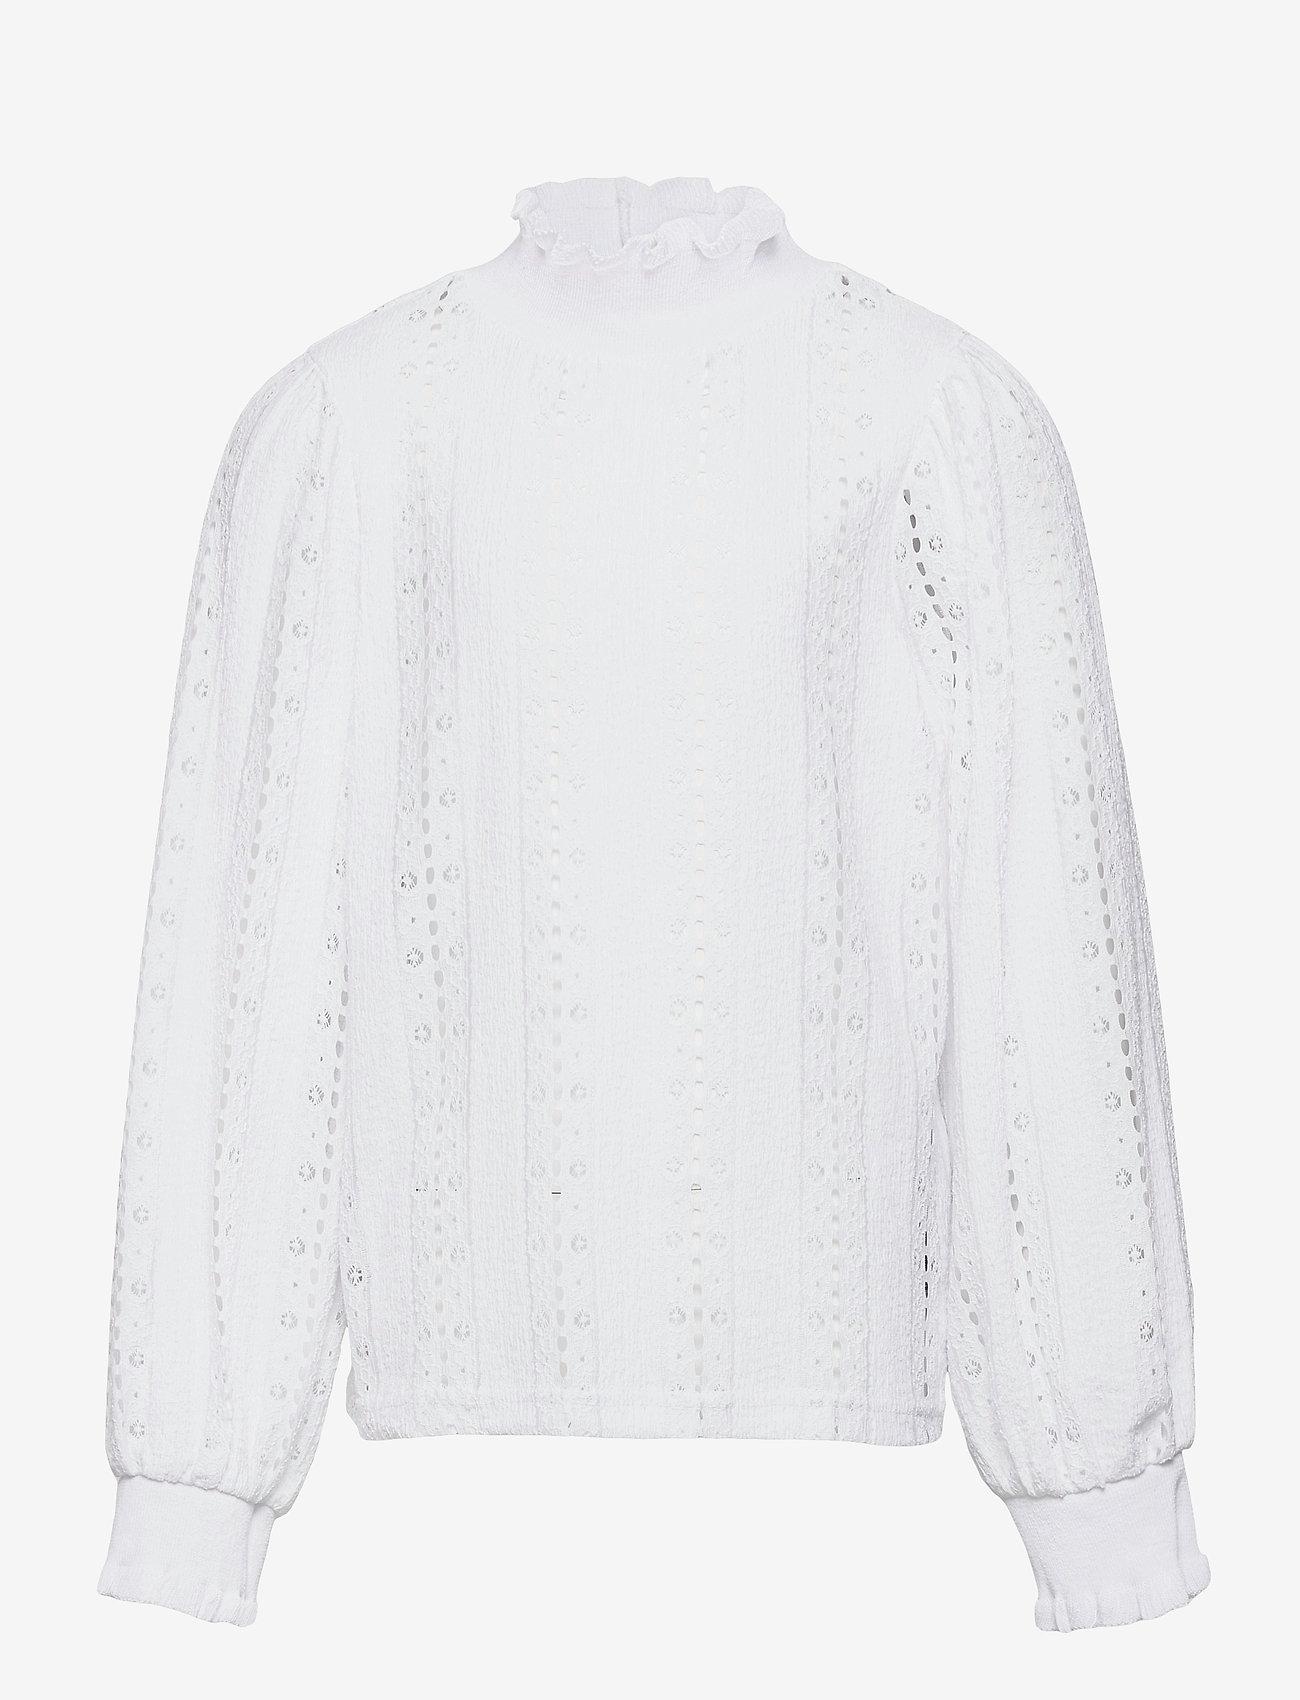 LMTD - NLFFLACE LS TURTLENECK TOP - blusen & tuniken - bright white - 0